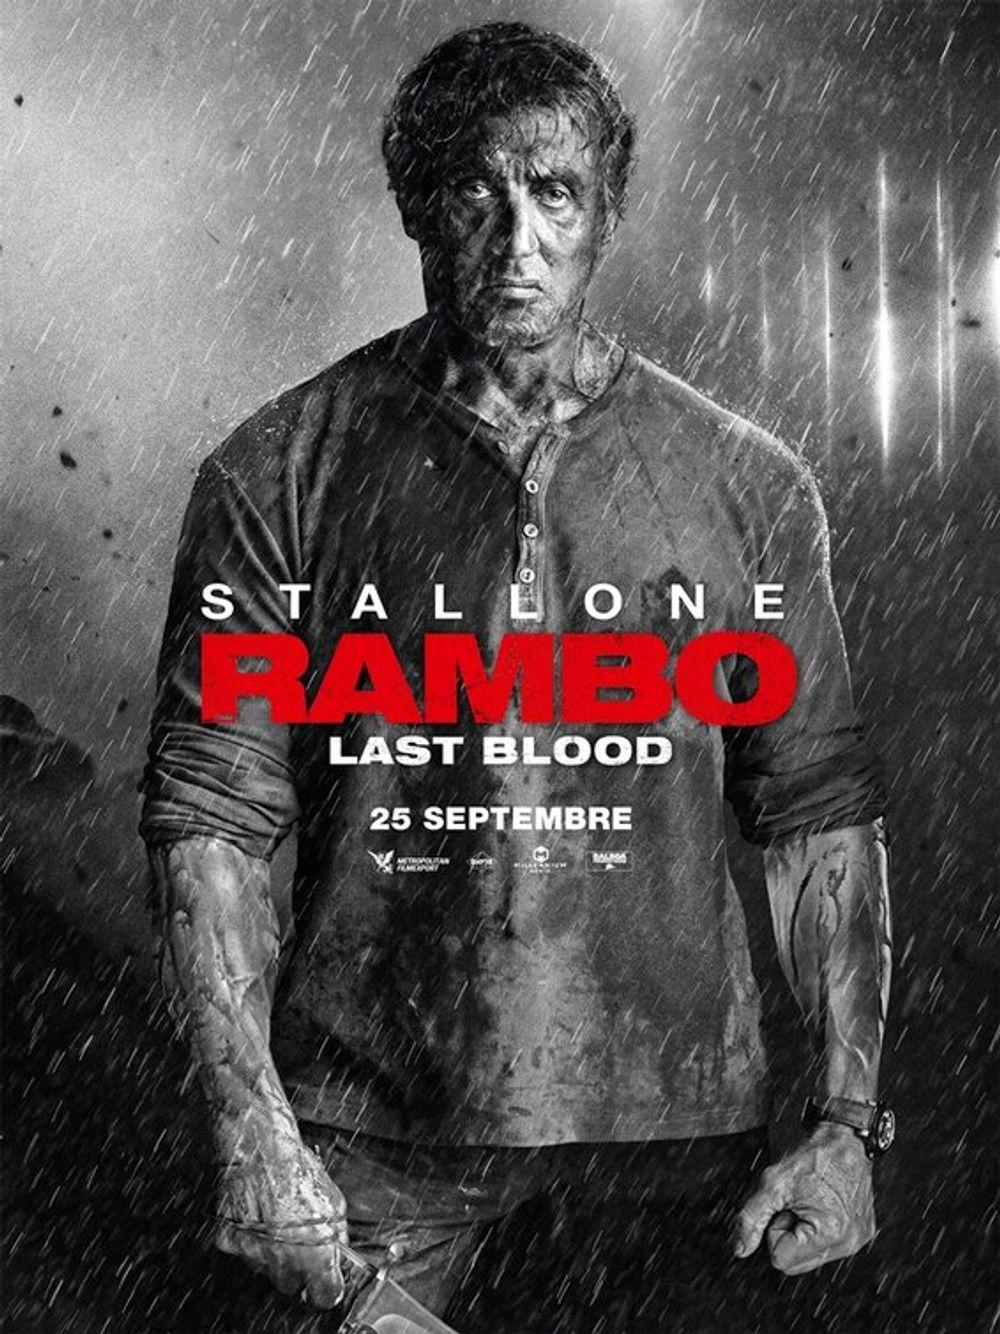 3-Rambo: Last Blood